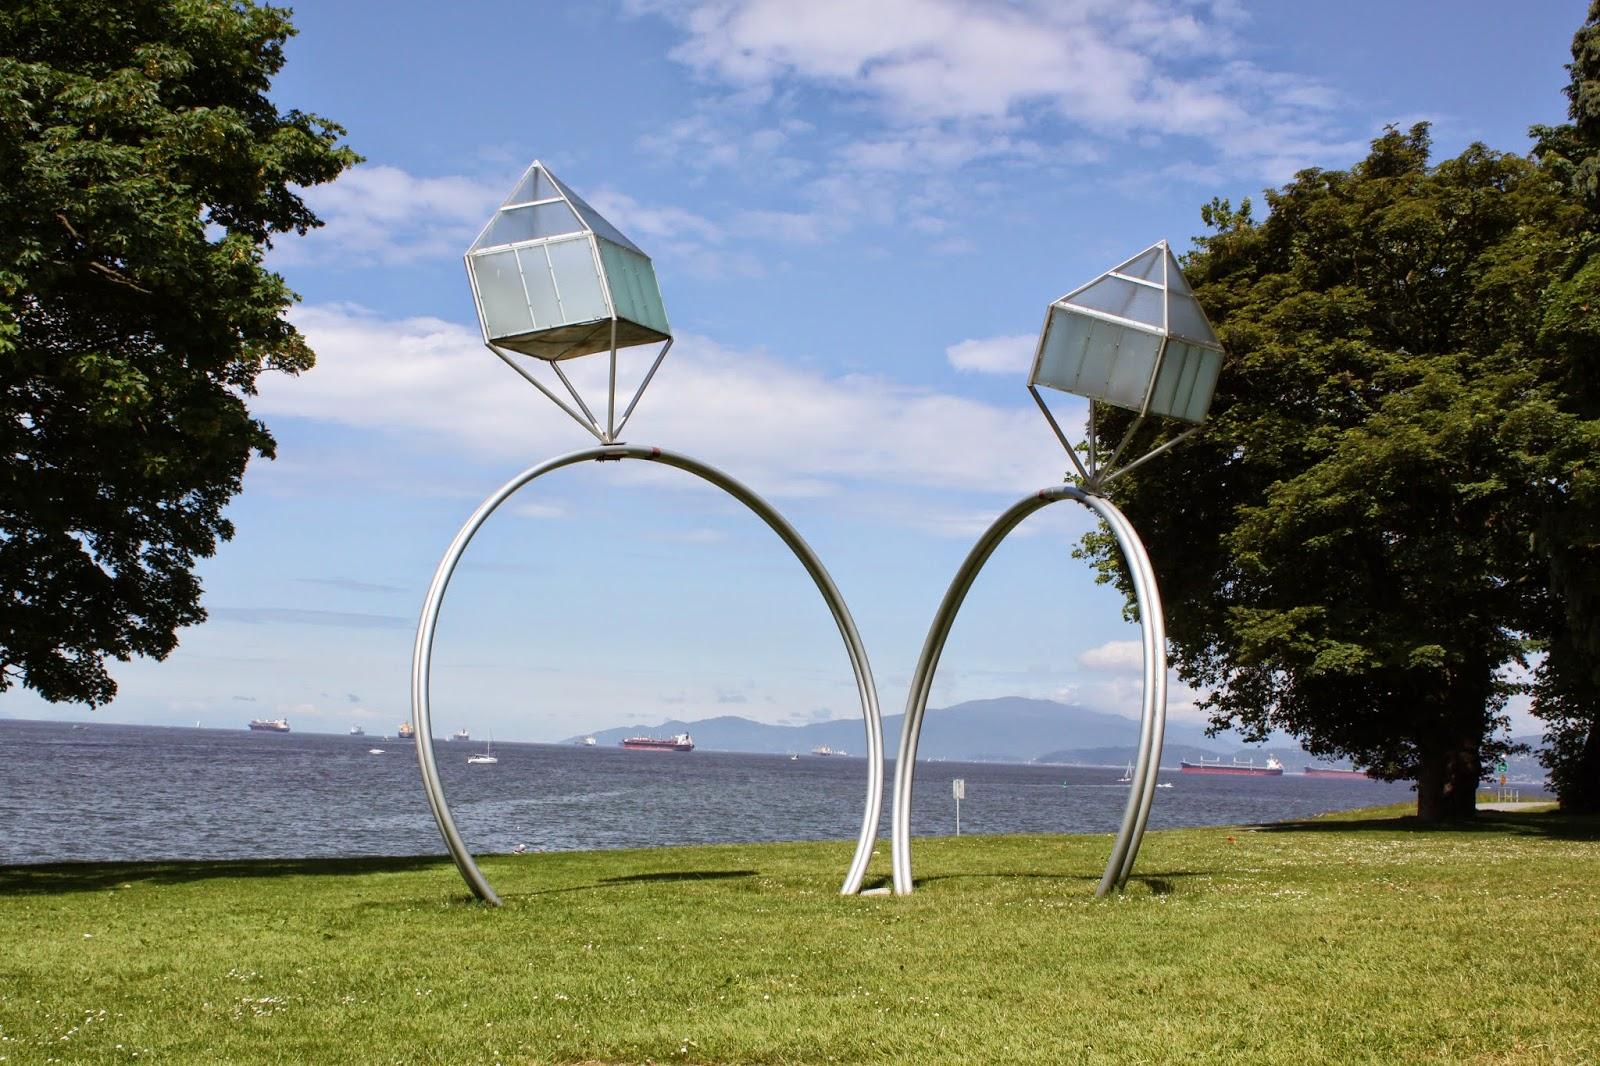 KEN的生活日記: [溫哥華Vancouver] 史丹利公園 Stanley Park 悠閒散步溜狗